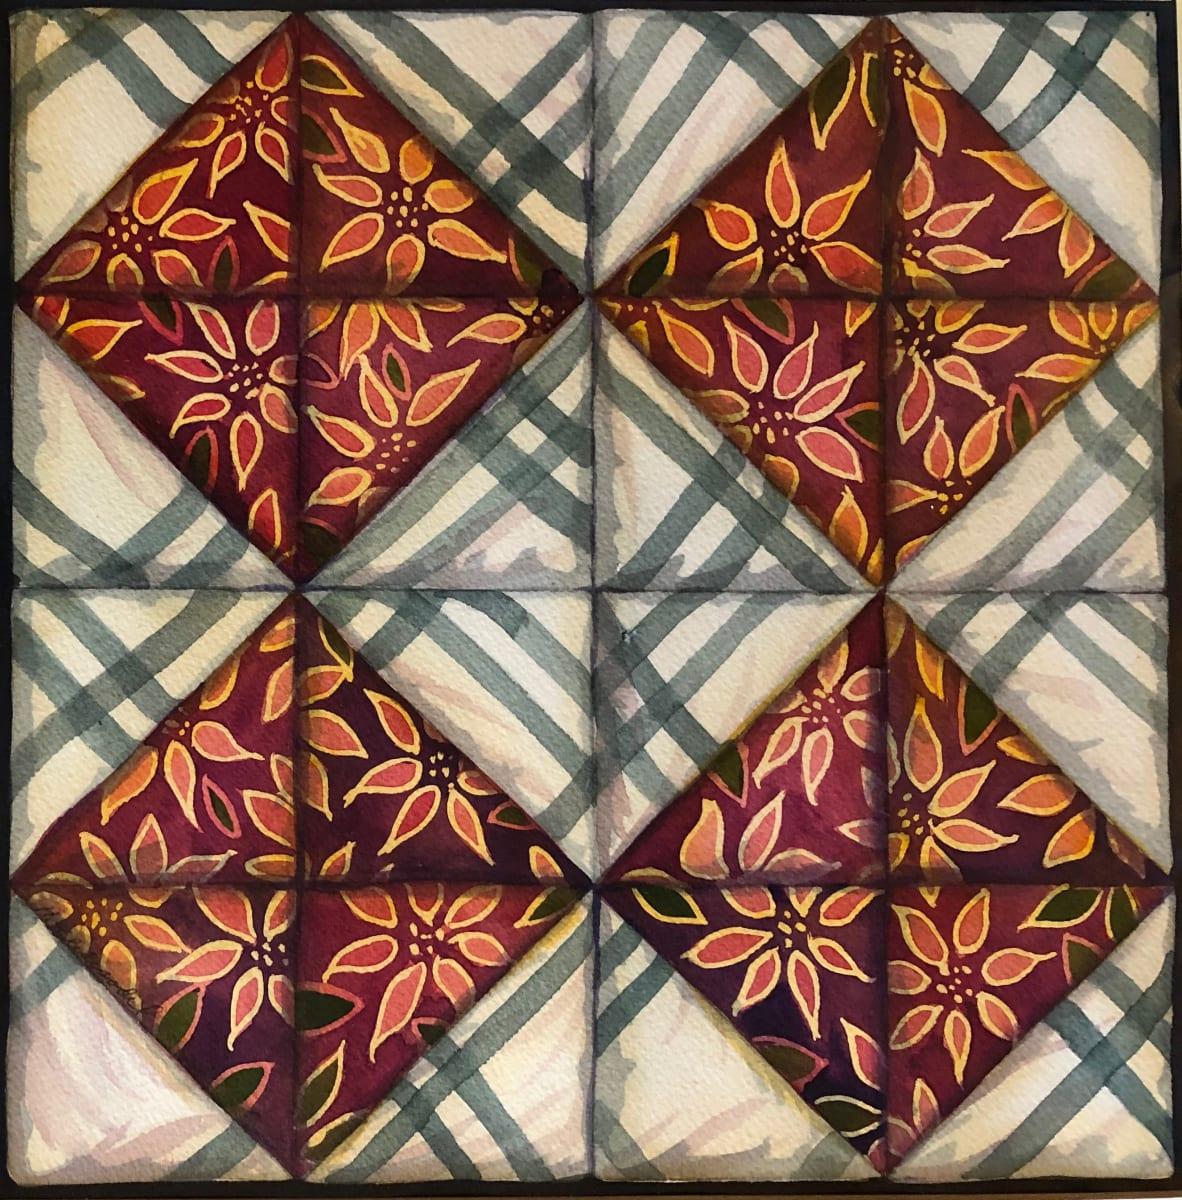 Quilt Square: Crossroads an original watercolor by Helen R Klebesadel